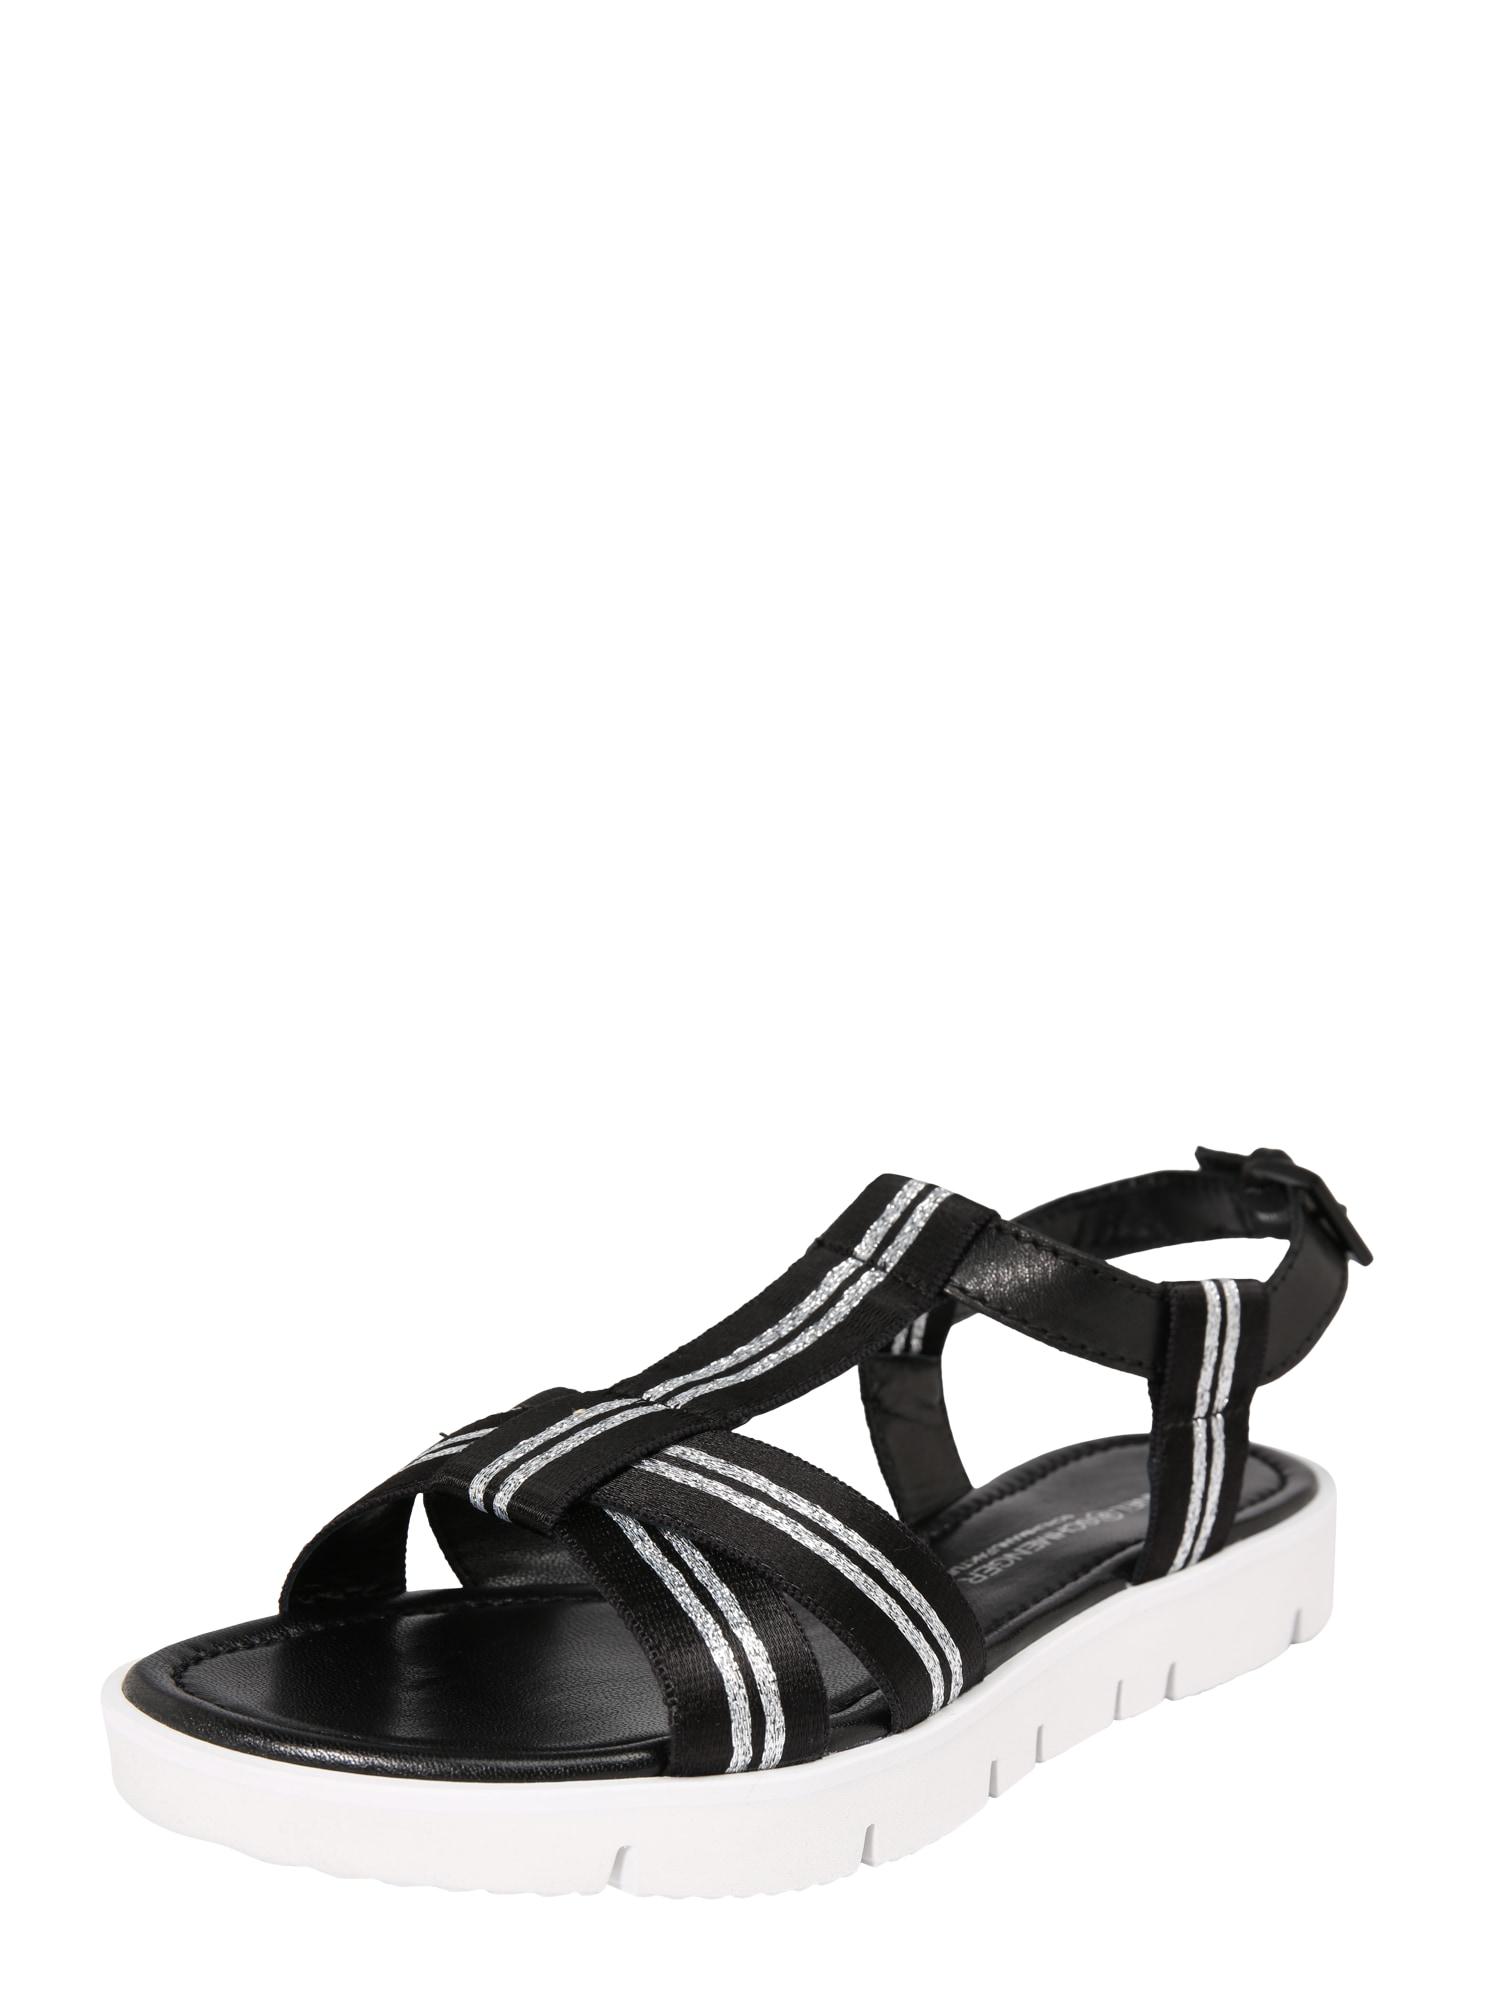 Sandály Elle X černá stříbrná Kennel & Schmenger